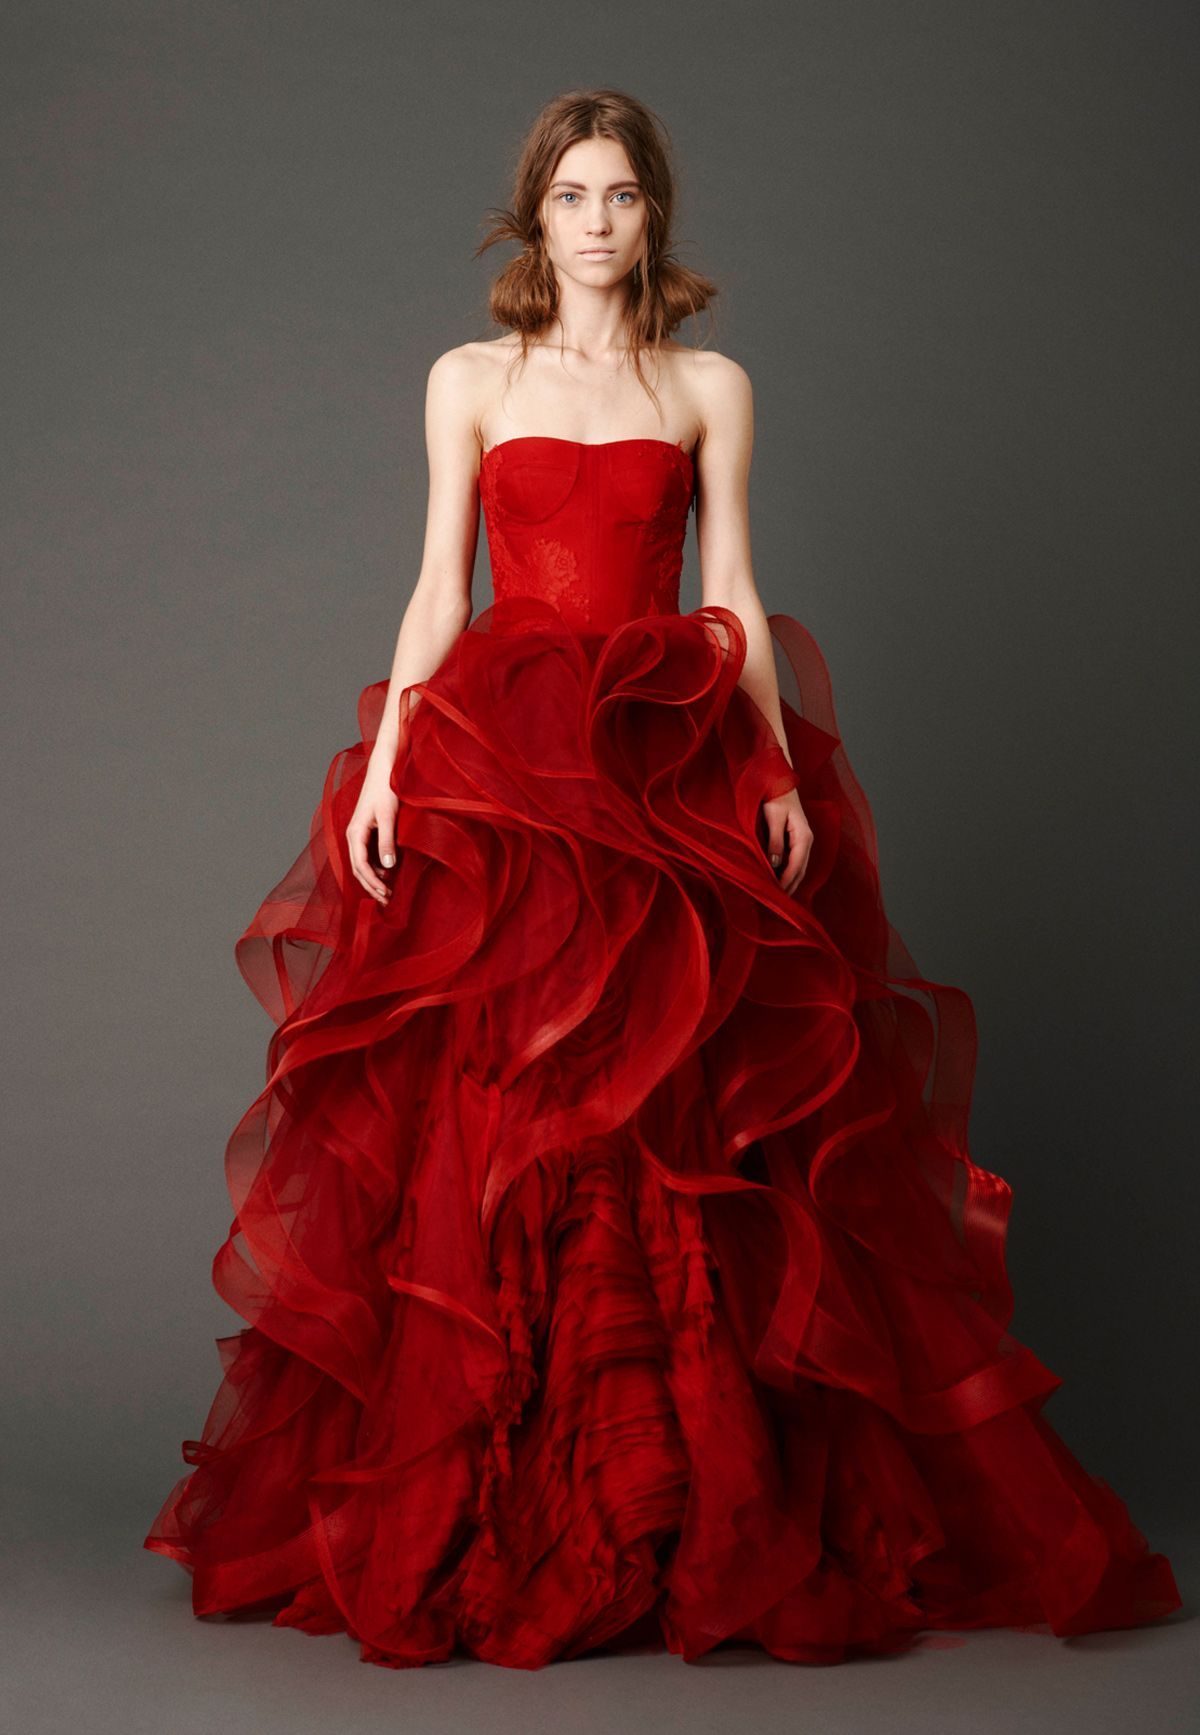 Wedding Dresses Bridal Gowns by Vera Wang  Iconic  Wedding dress